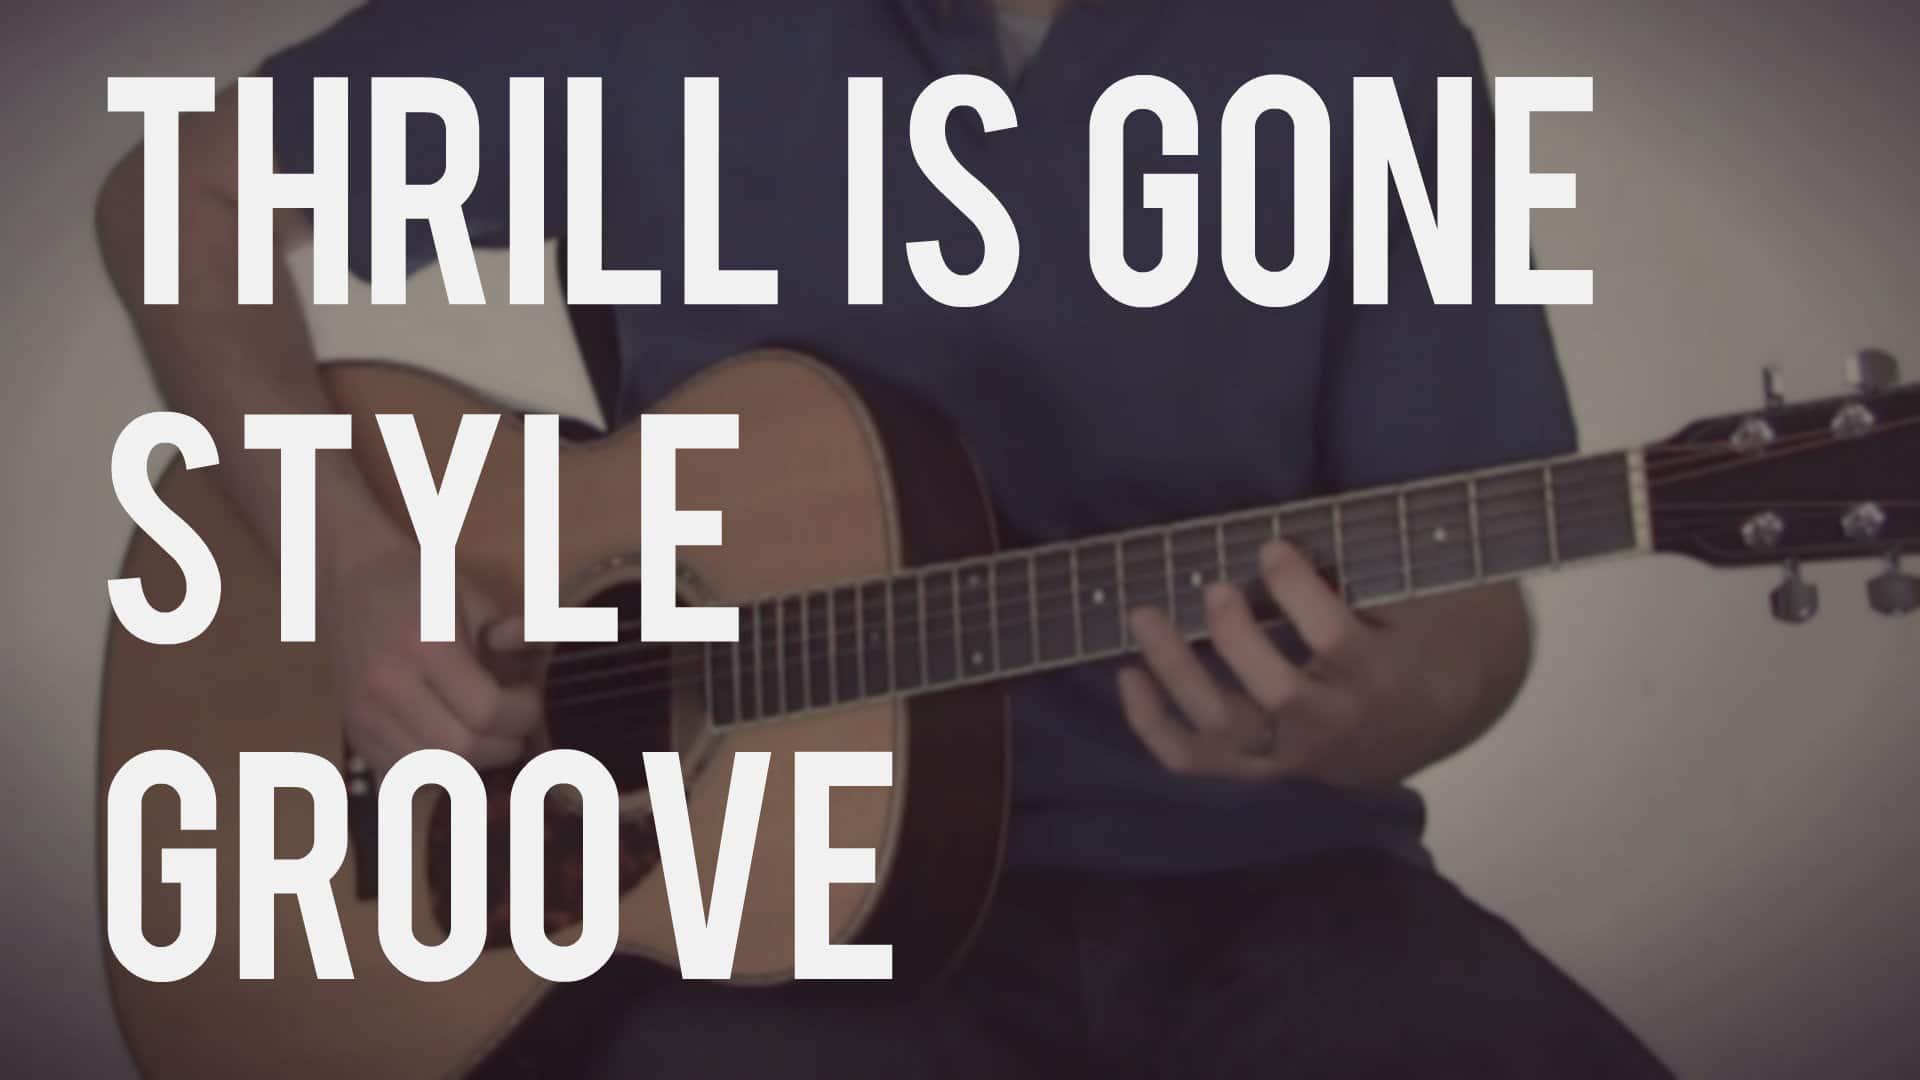 A Funky Twist On The Thrill Is Gone Chord Progression Tb101